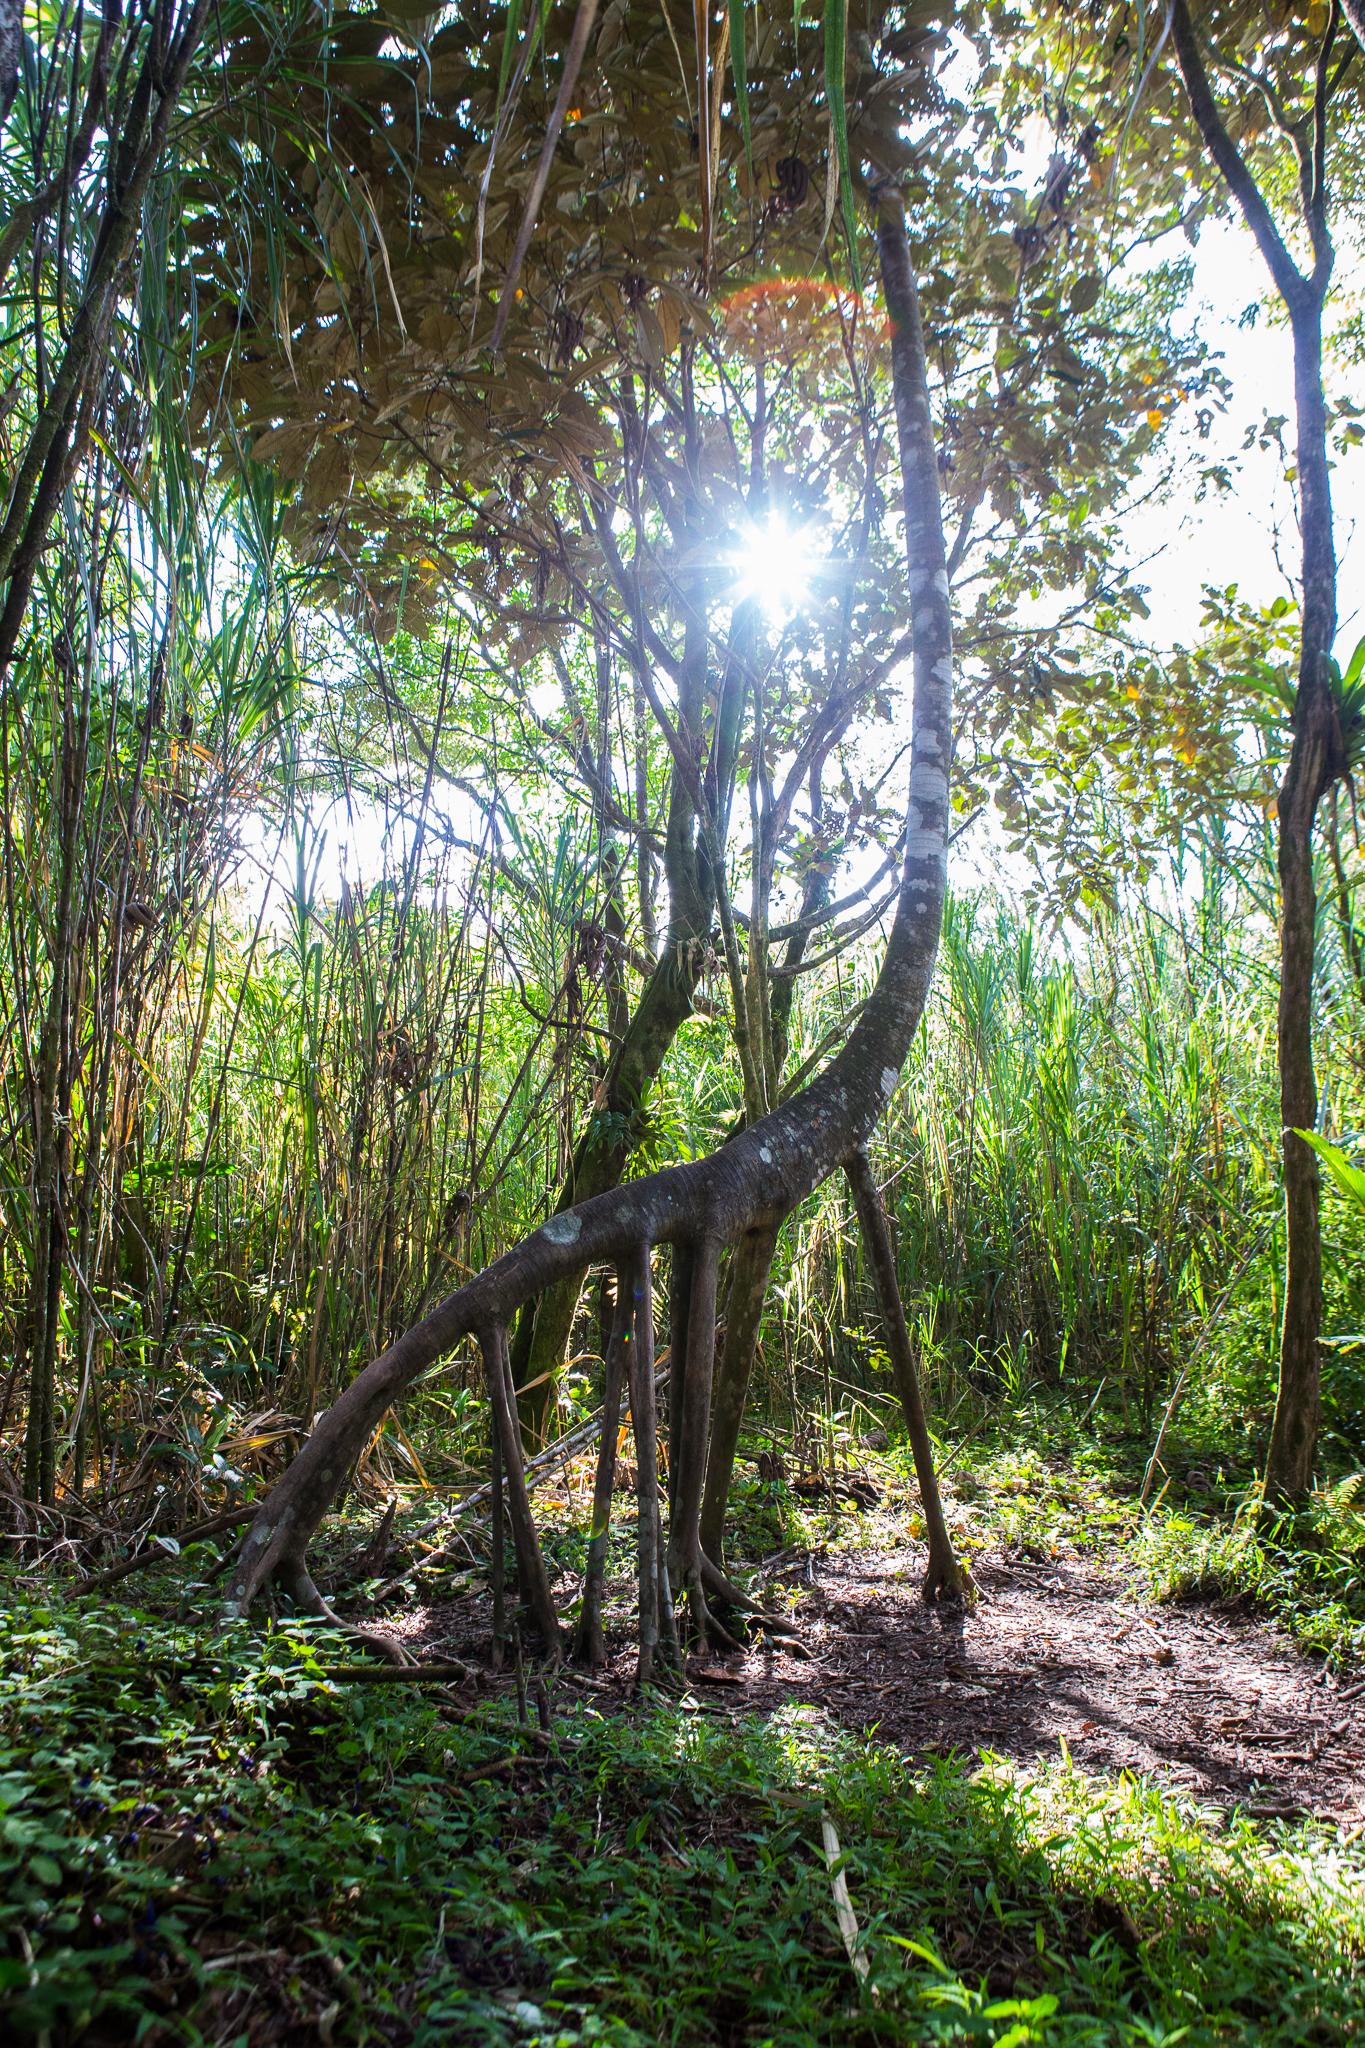 The giraffe tree had some impressive roots